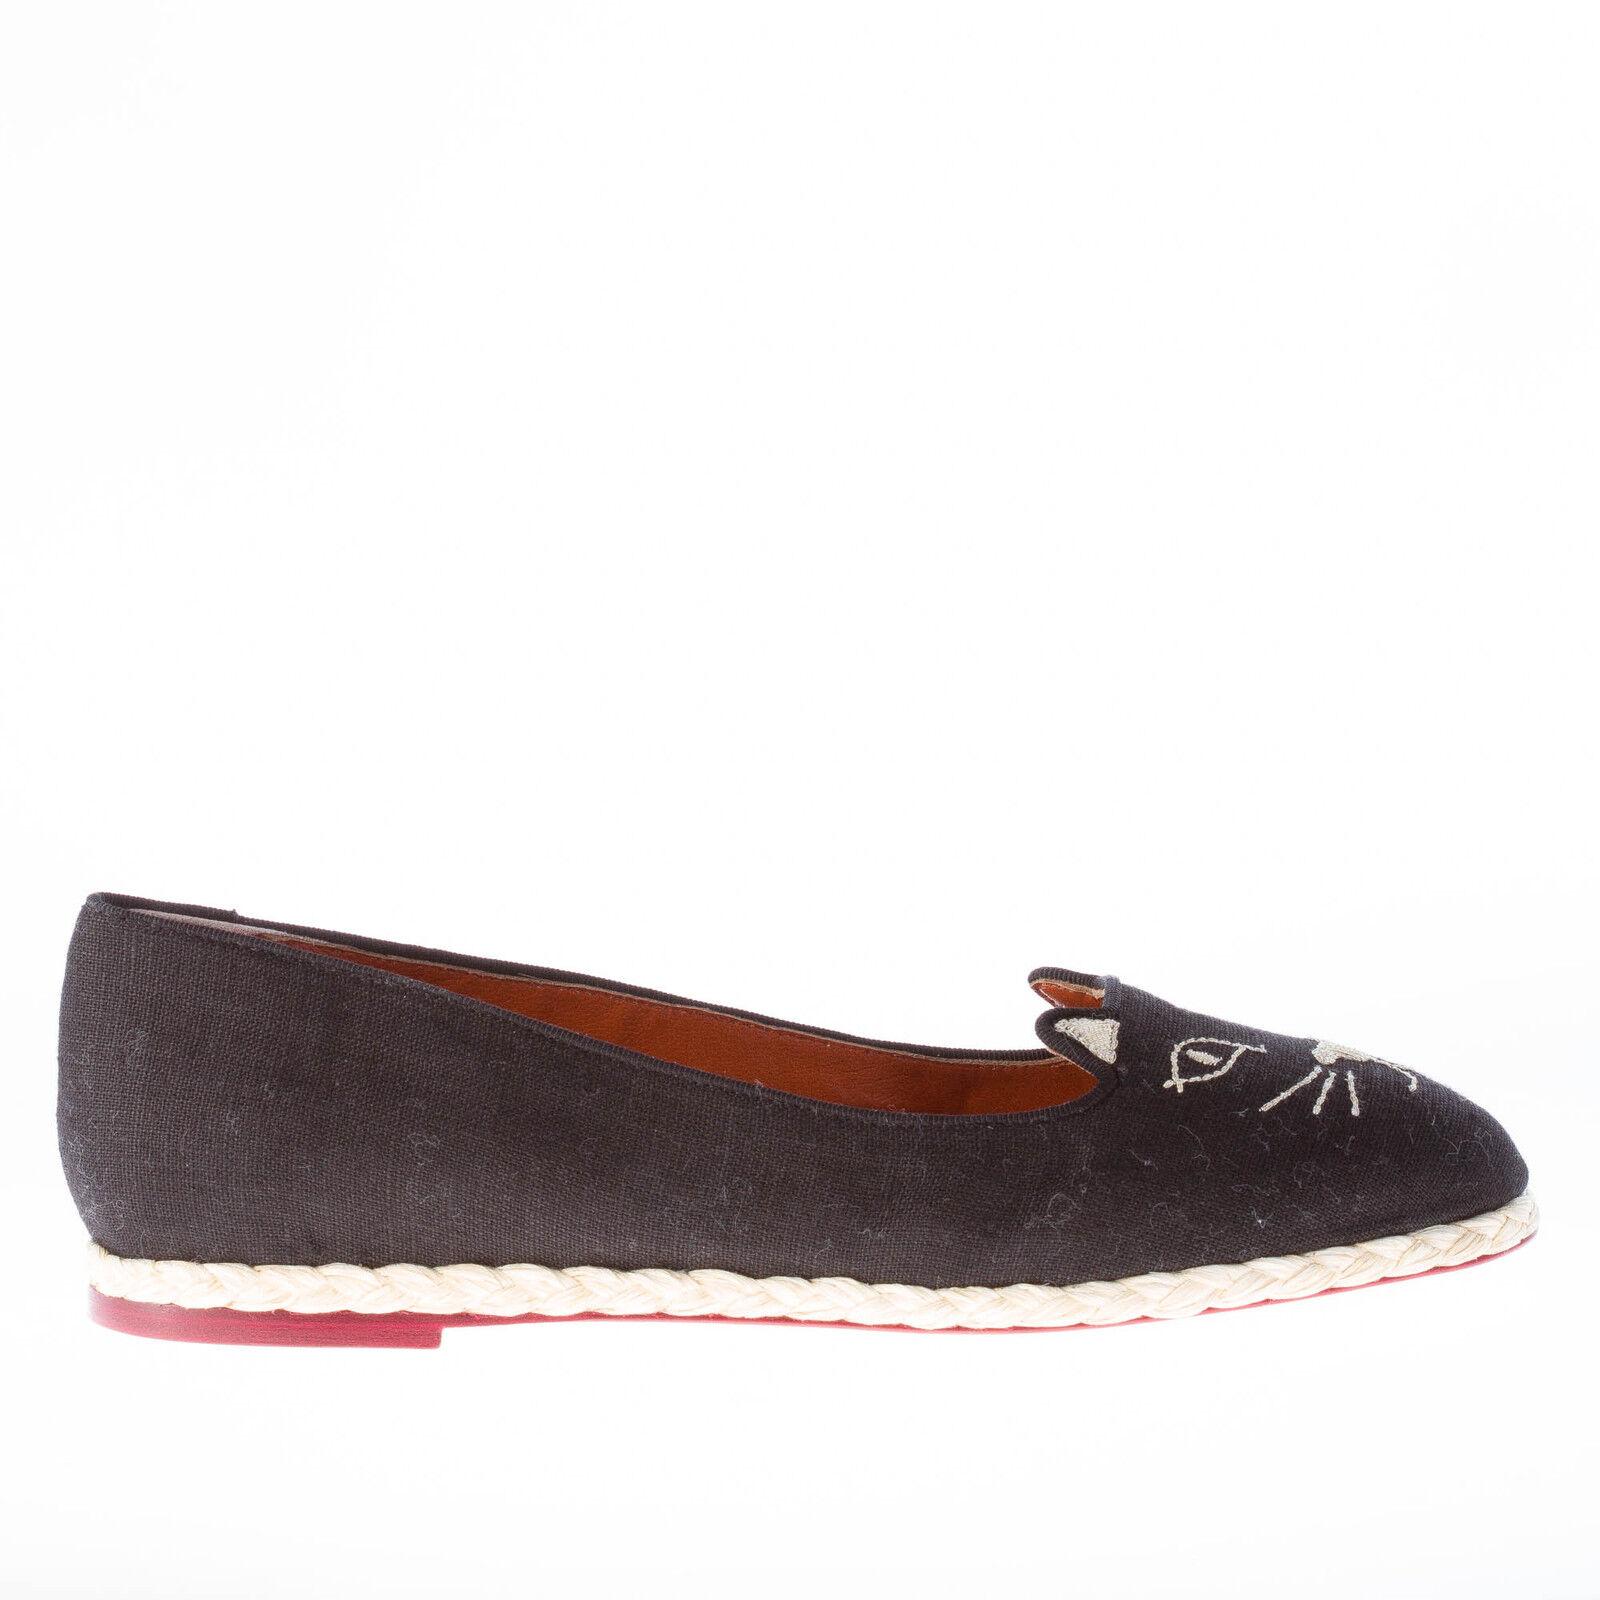 Charlotte Olympia Mujer Mujer Mujer Zapatos Negro Lino Capri Gatos ESPADRILLAS Plano oro Kitty  tienda en linea